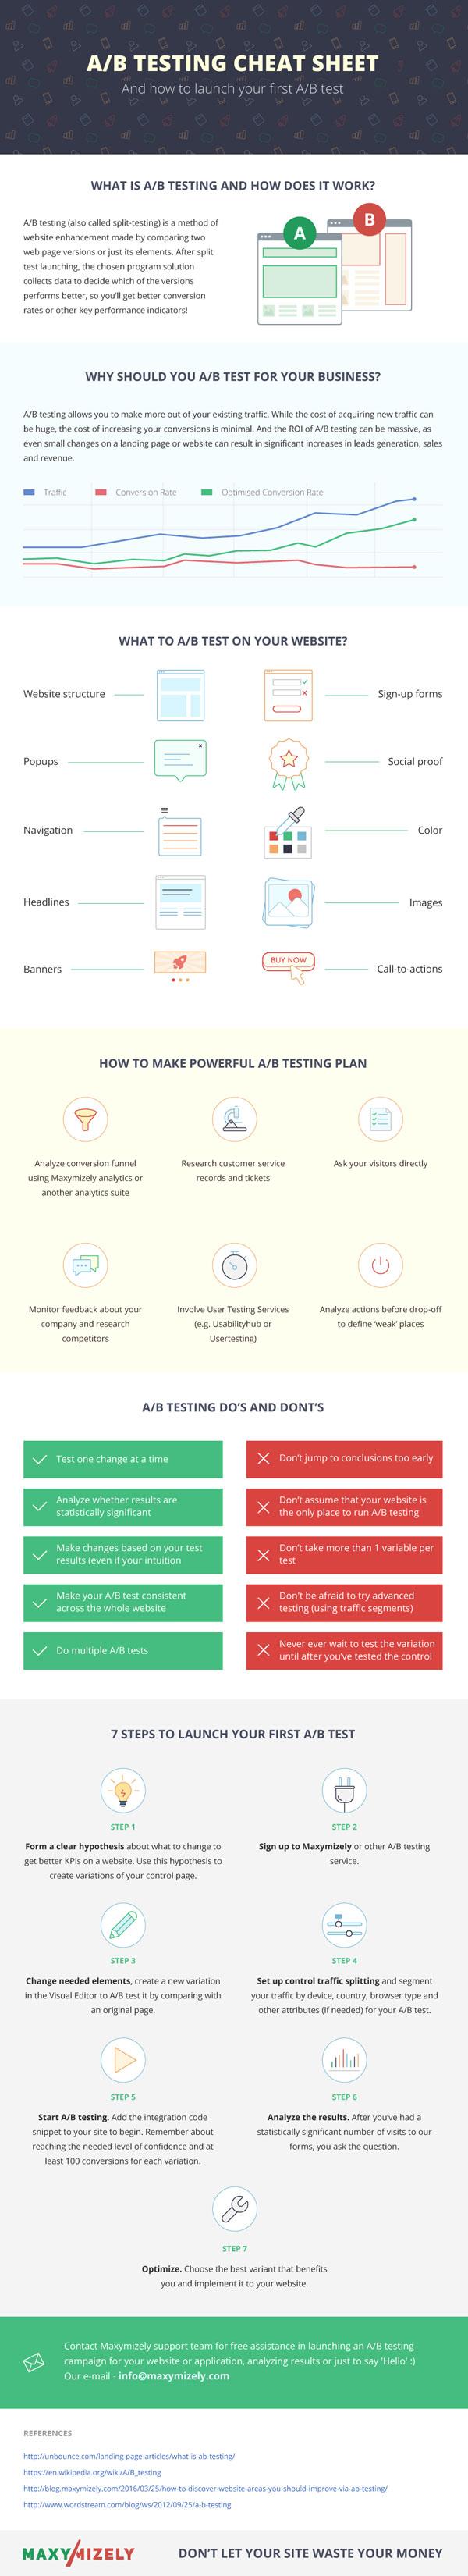 AB-Testing-Cheat-Sheet